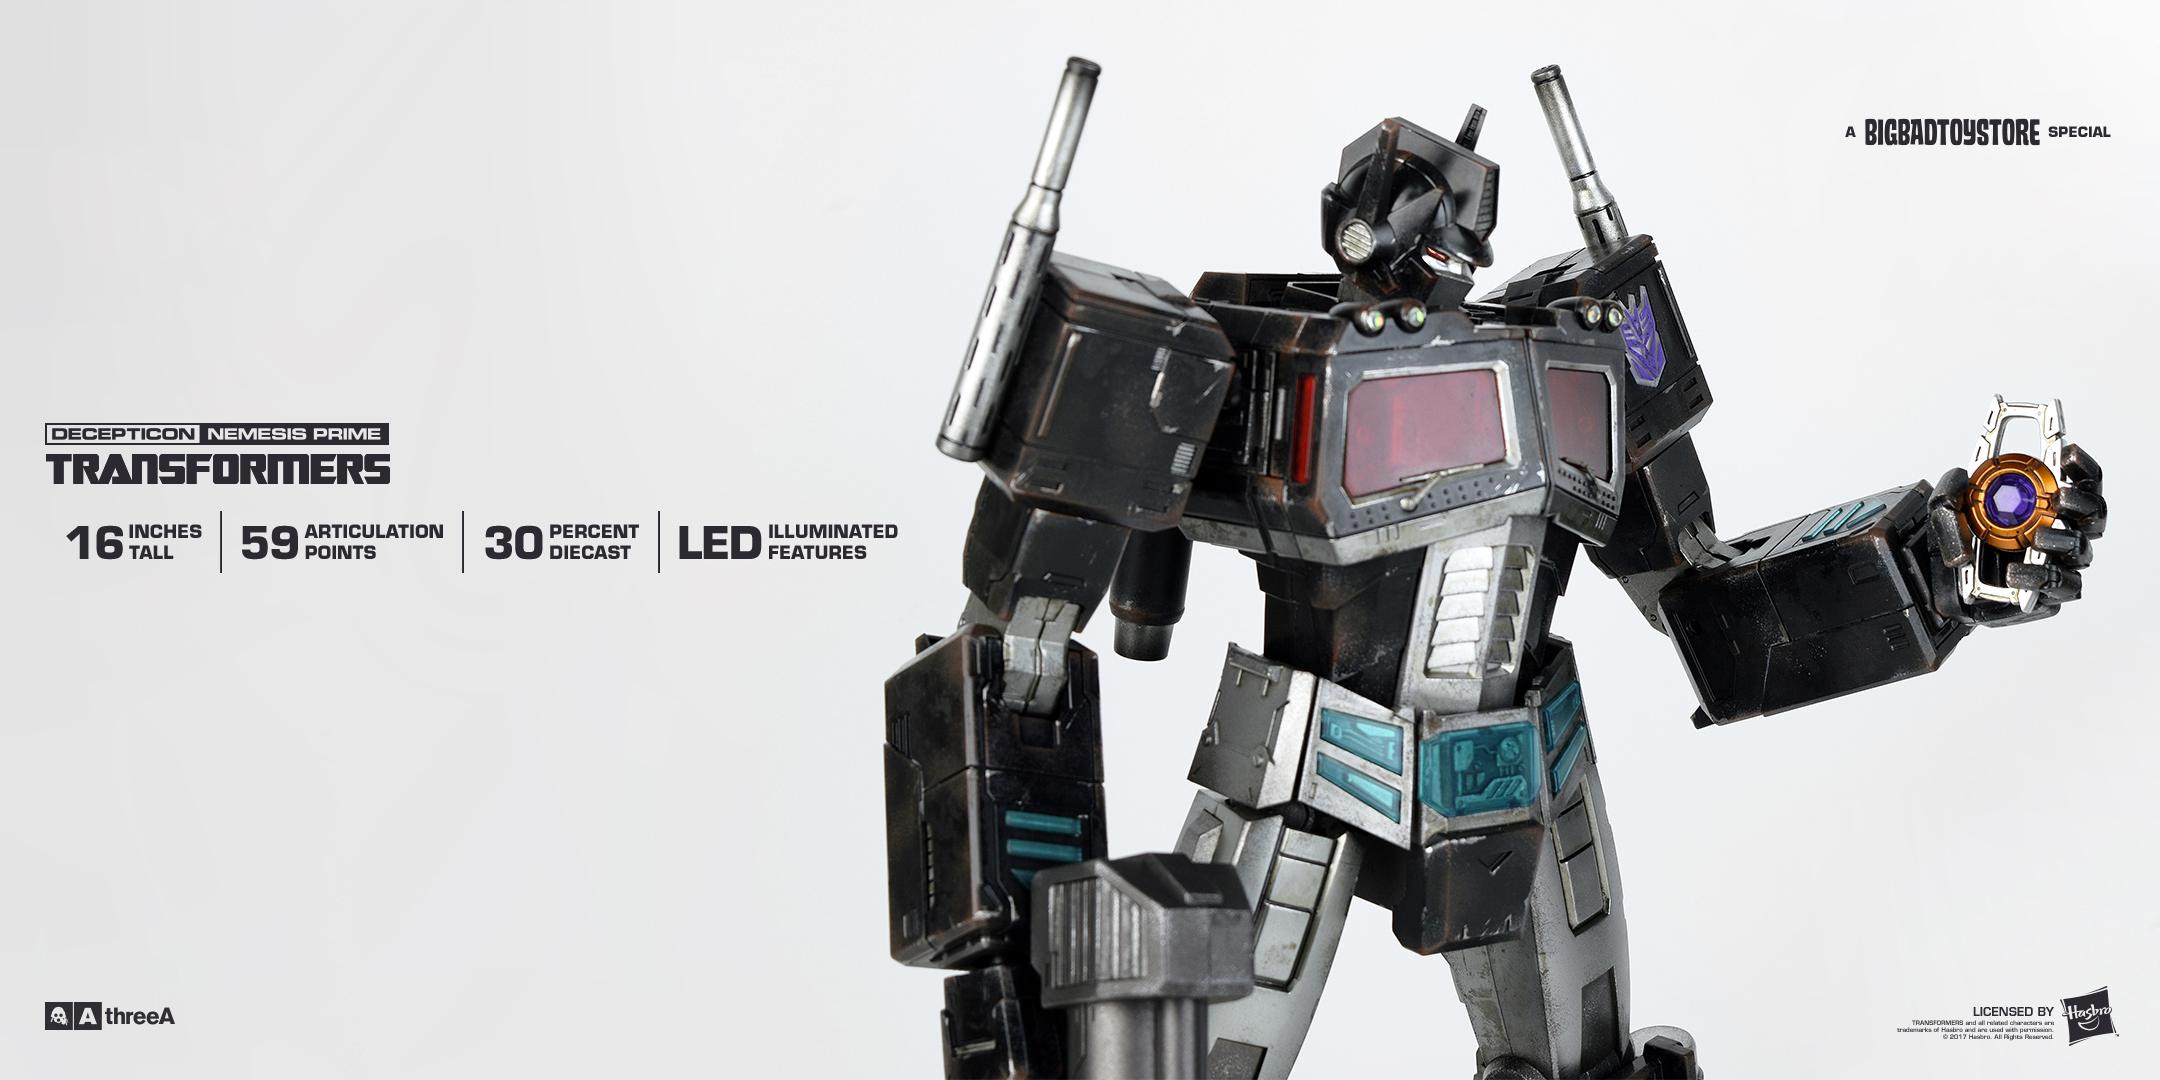 3A_Hasbro_Transformers_NemesisPrime_Landscape_v003.jpg